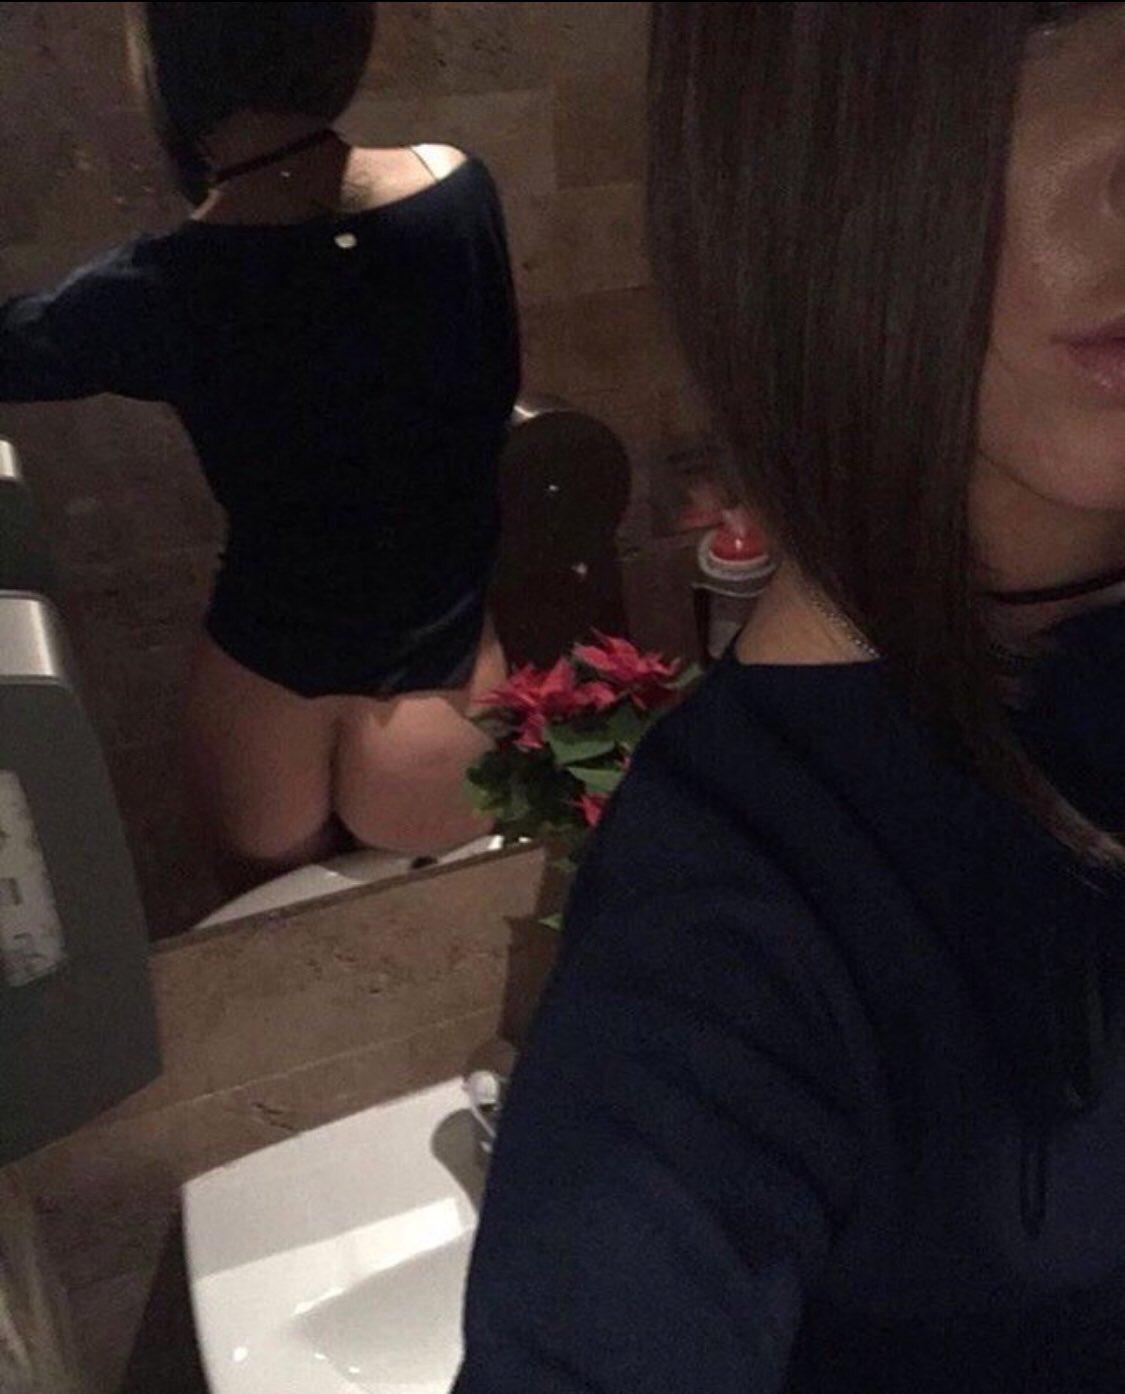 Ольга Бузова Слив Хакеров